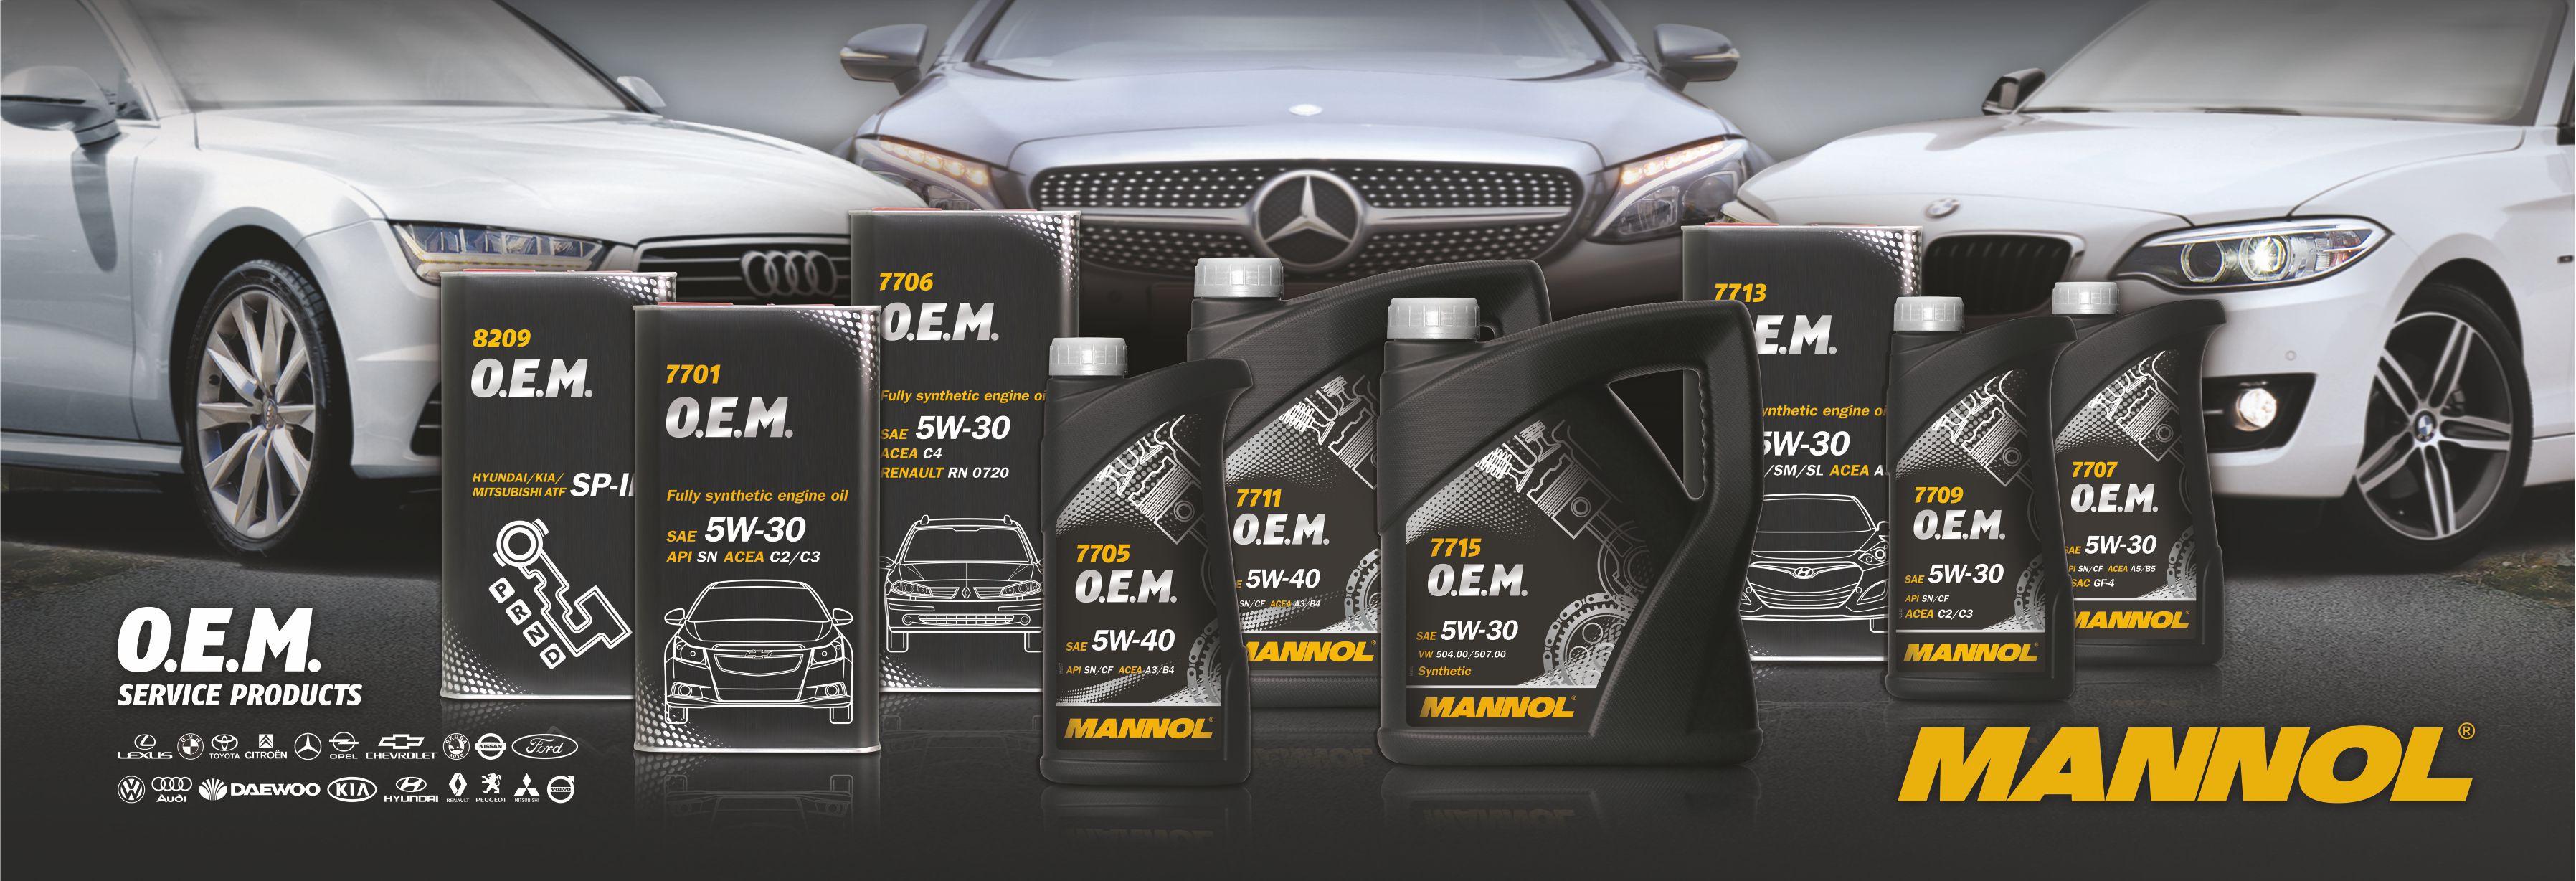 O.E.M. motorové oleje Mannol